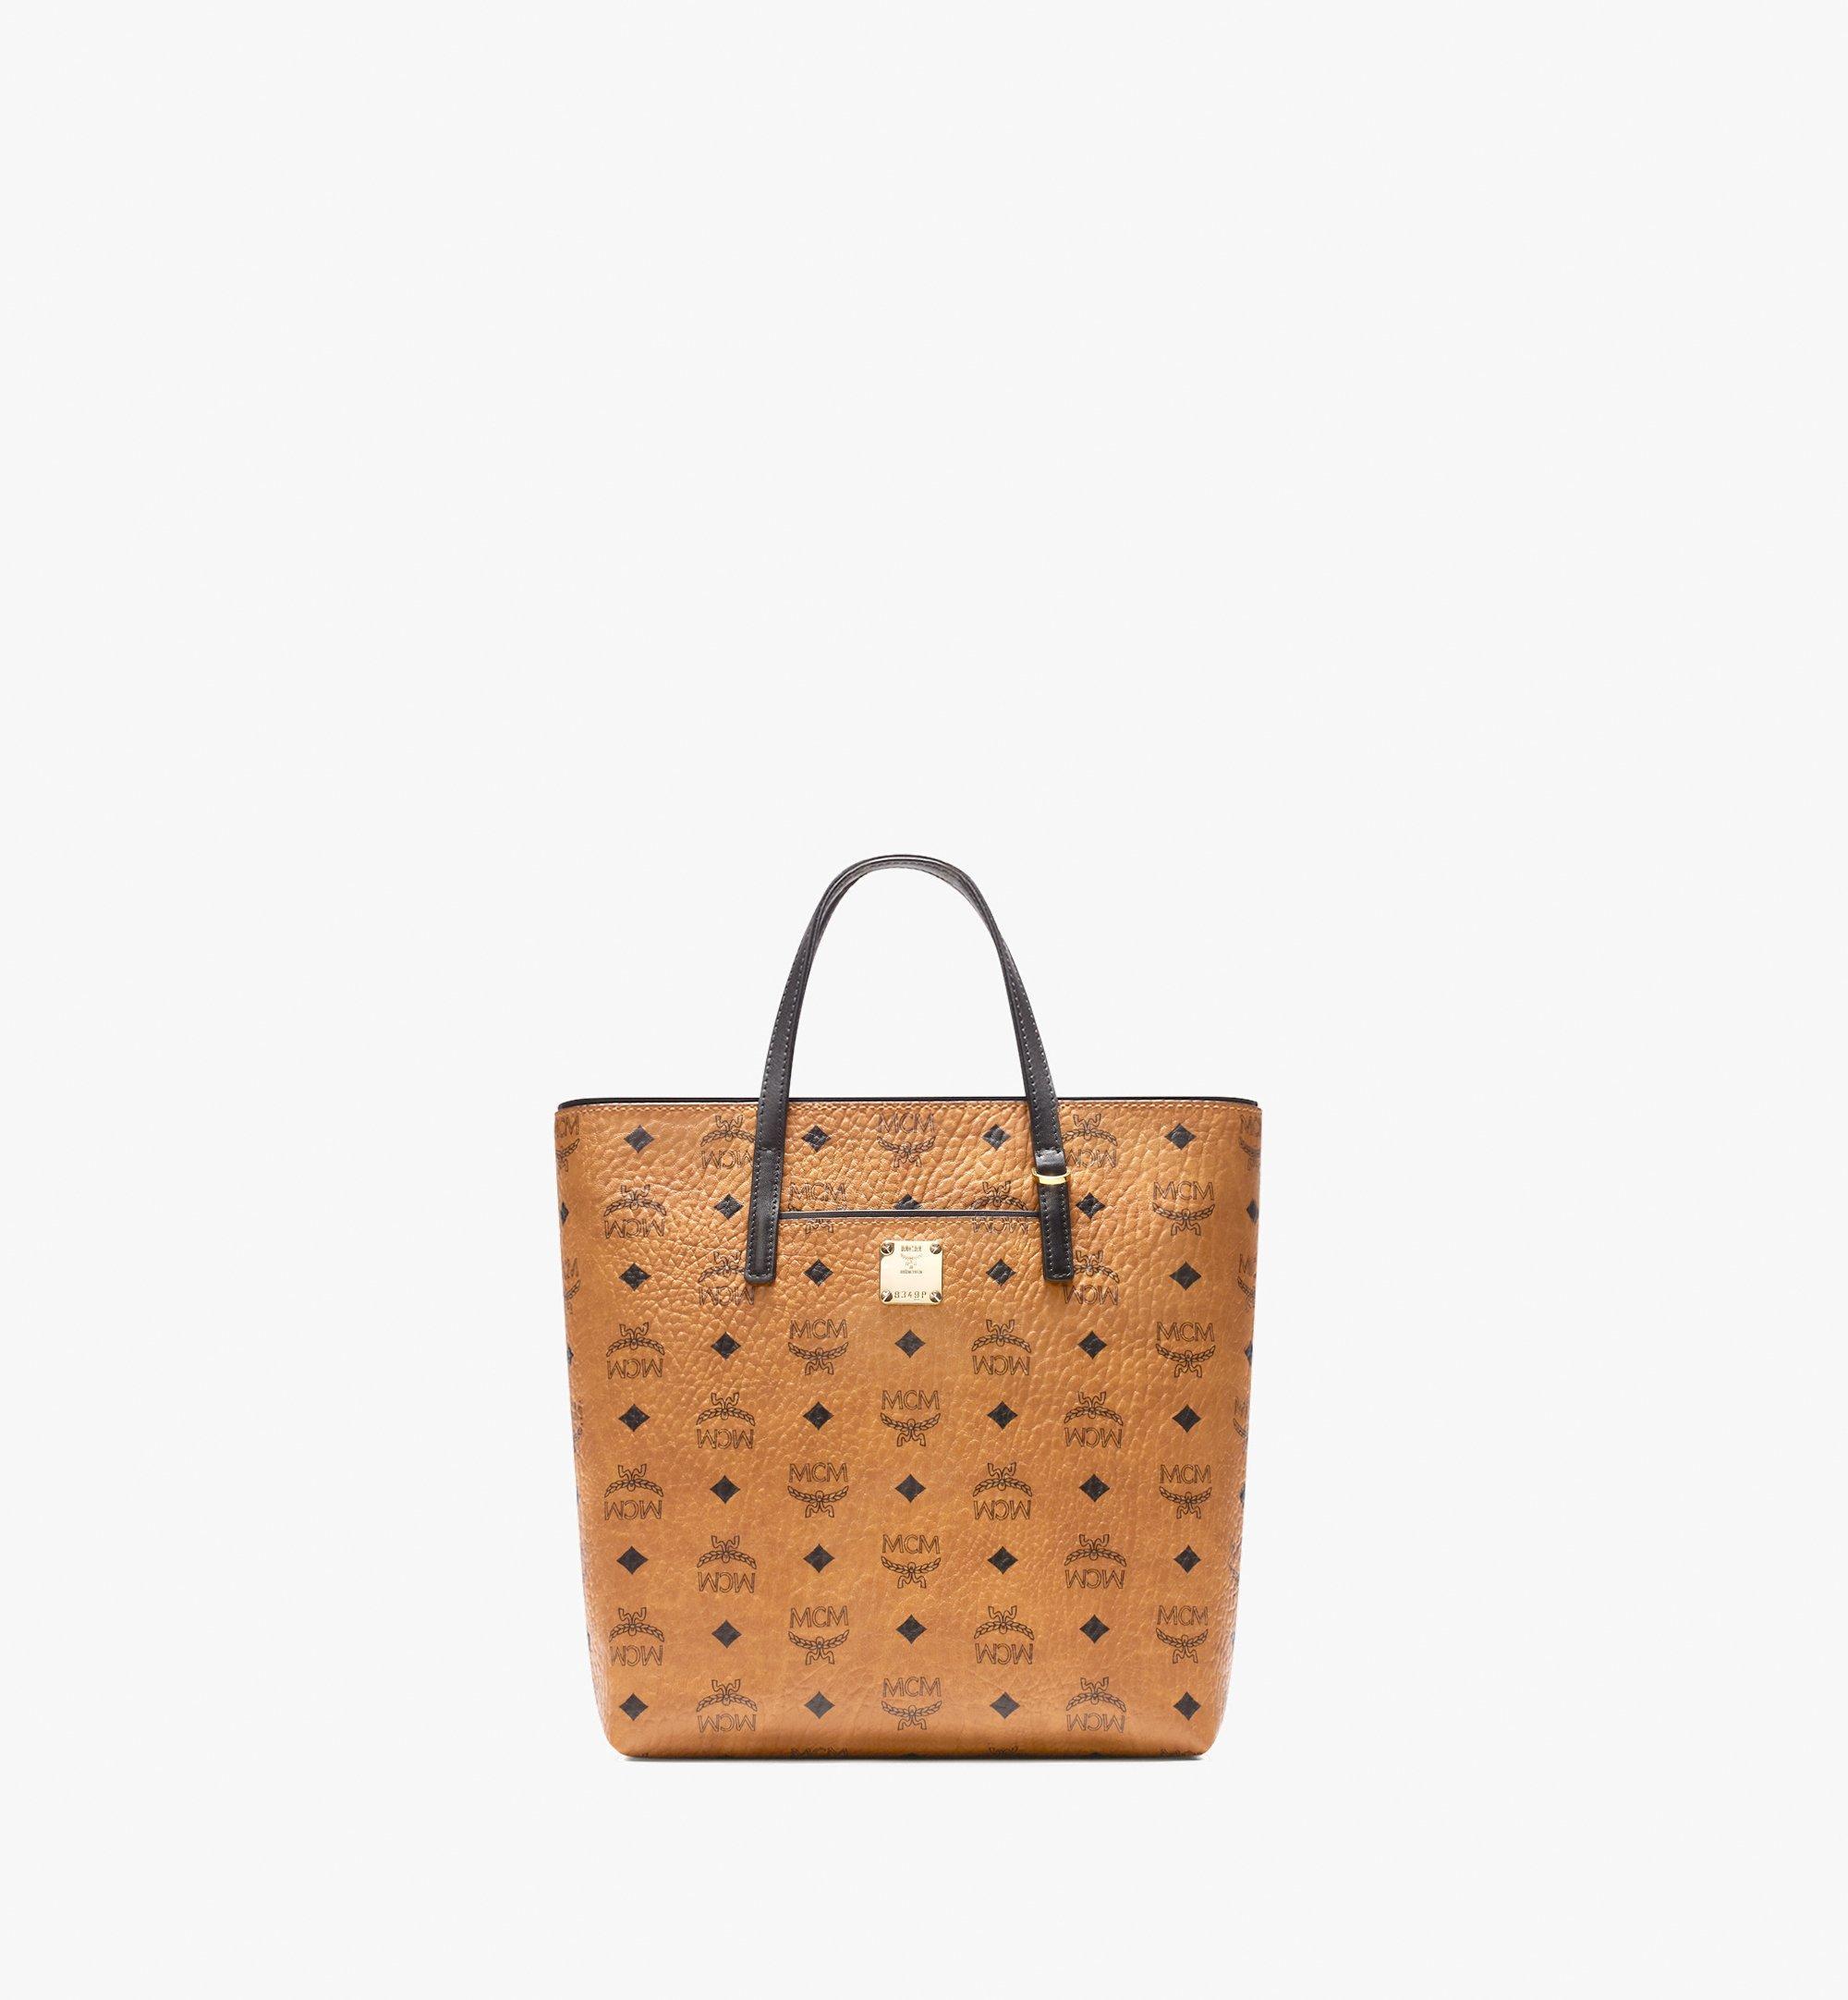 Medium Anya Shopper in Visetos Cognac | MCM® DE